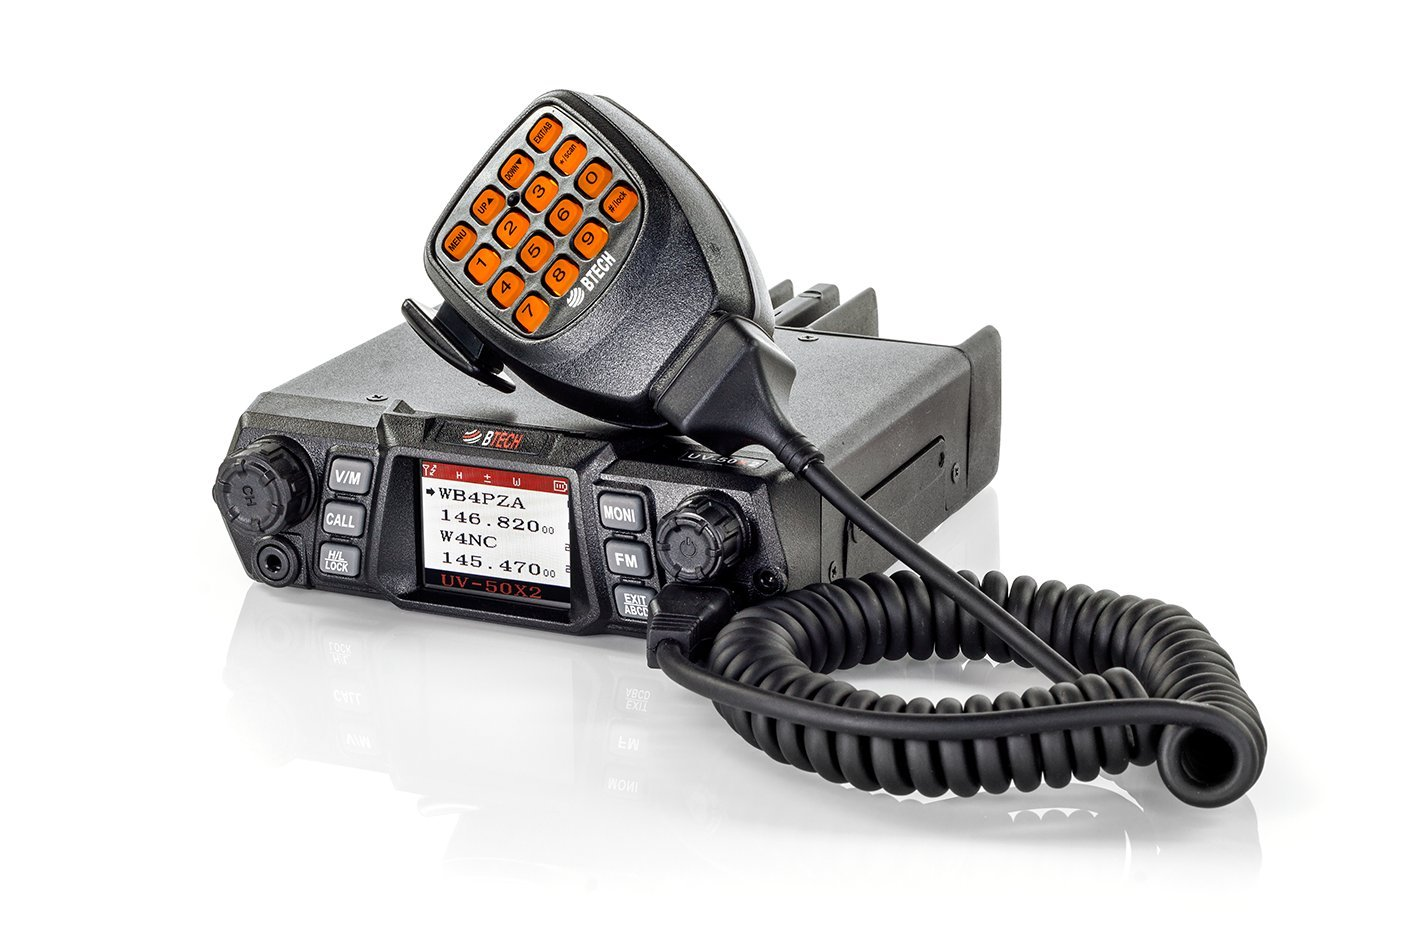 BTECH MOBILE UV-50X2 50 Watt Dual Band Base, Mobile Radio: 136-174mhz (VHF) 400-520mhz (UHF) Amateur (Ham)